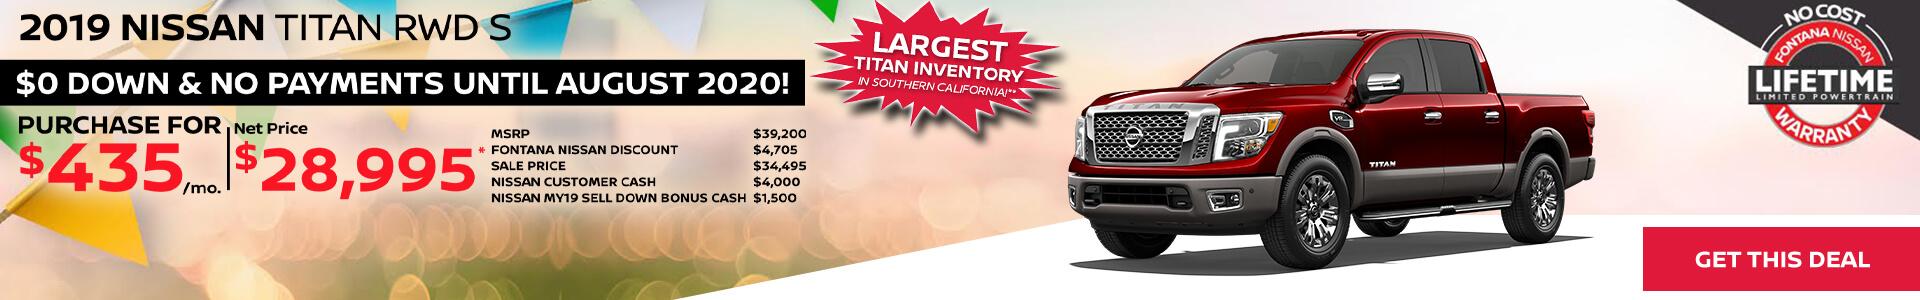 Nissan Titan $435